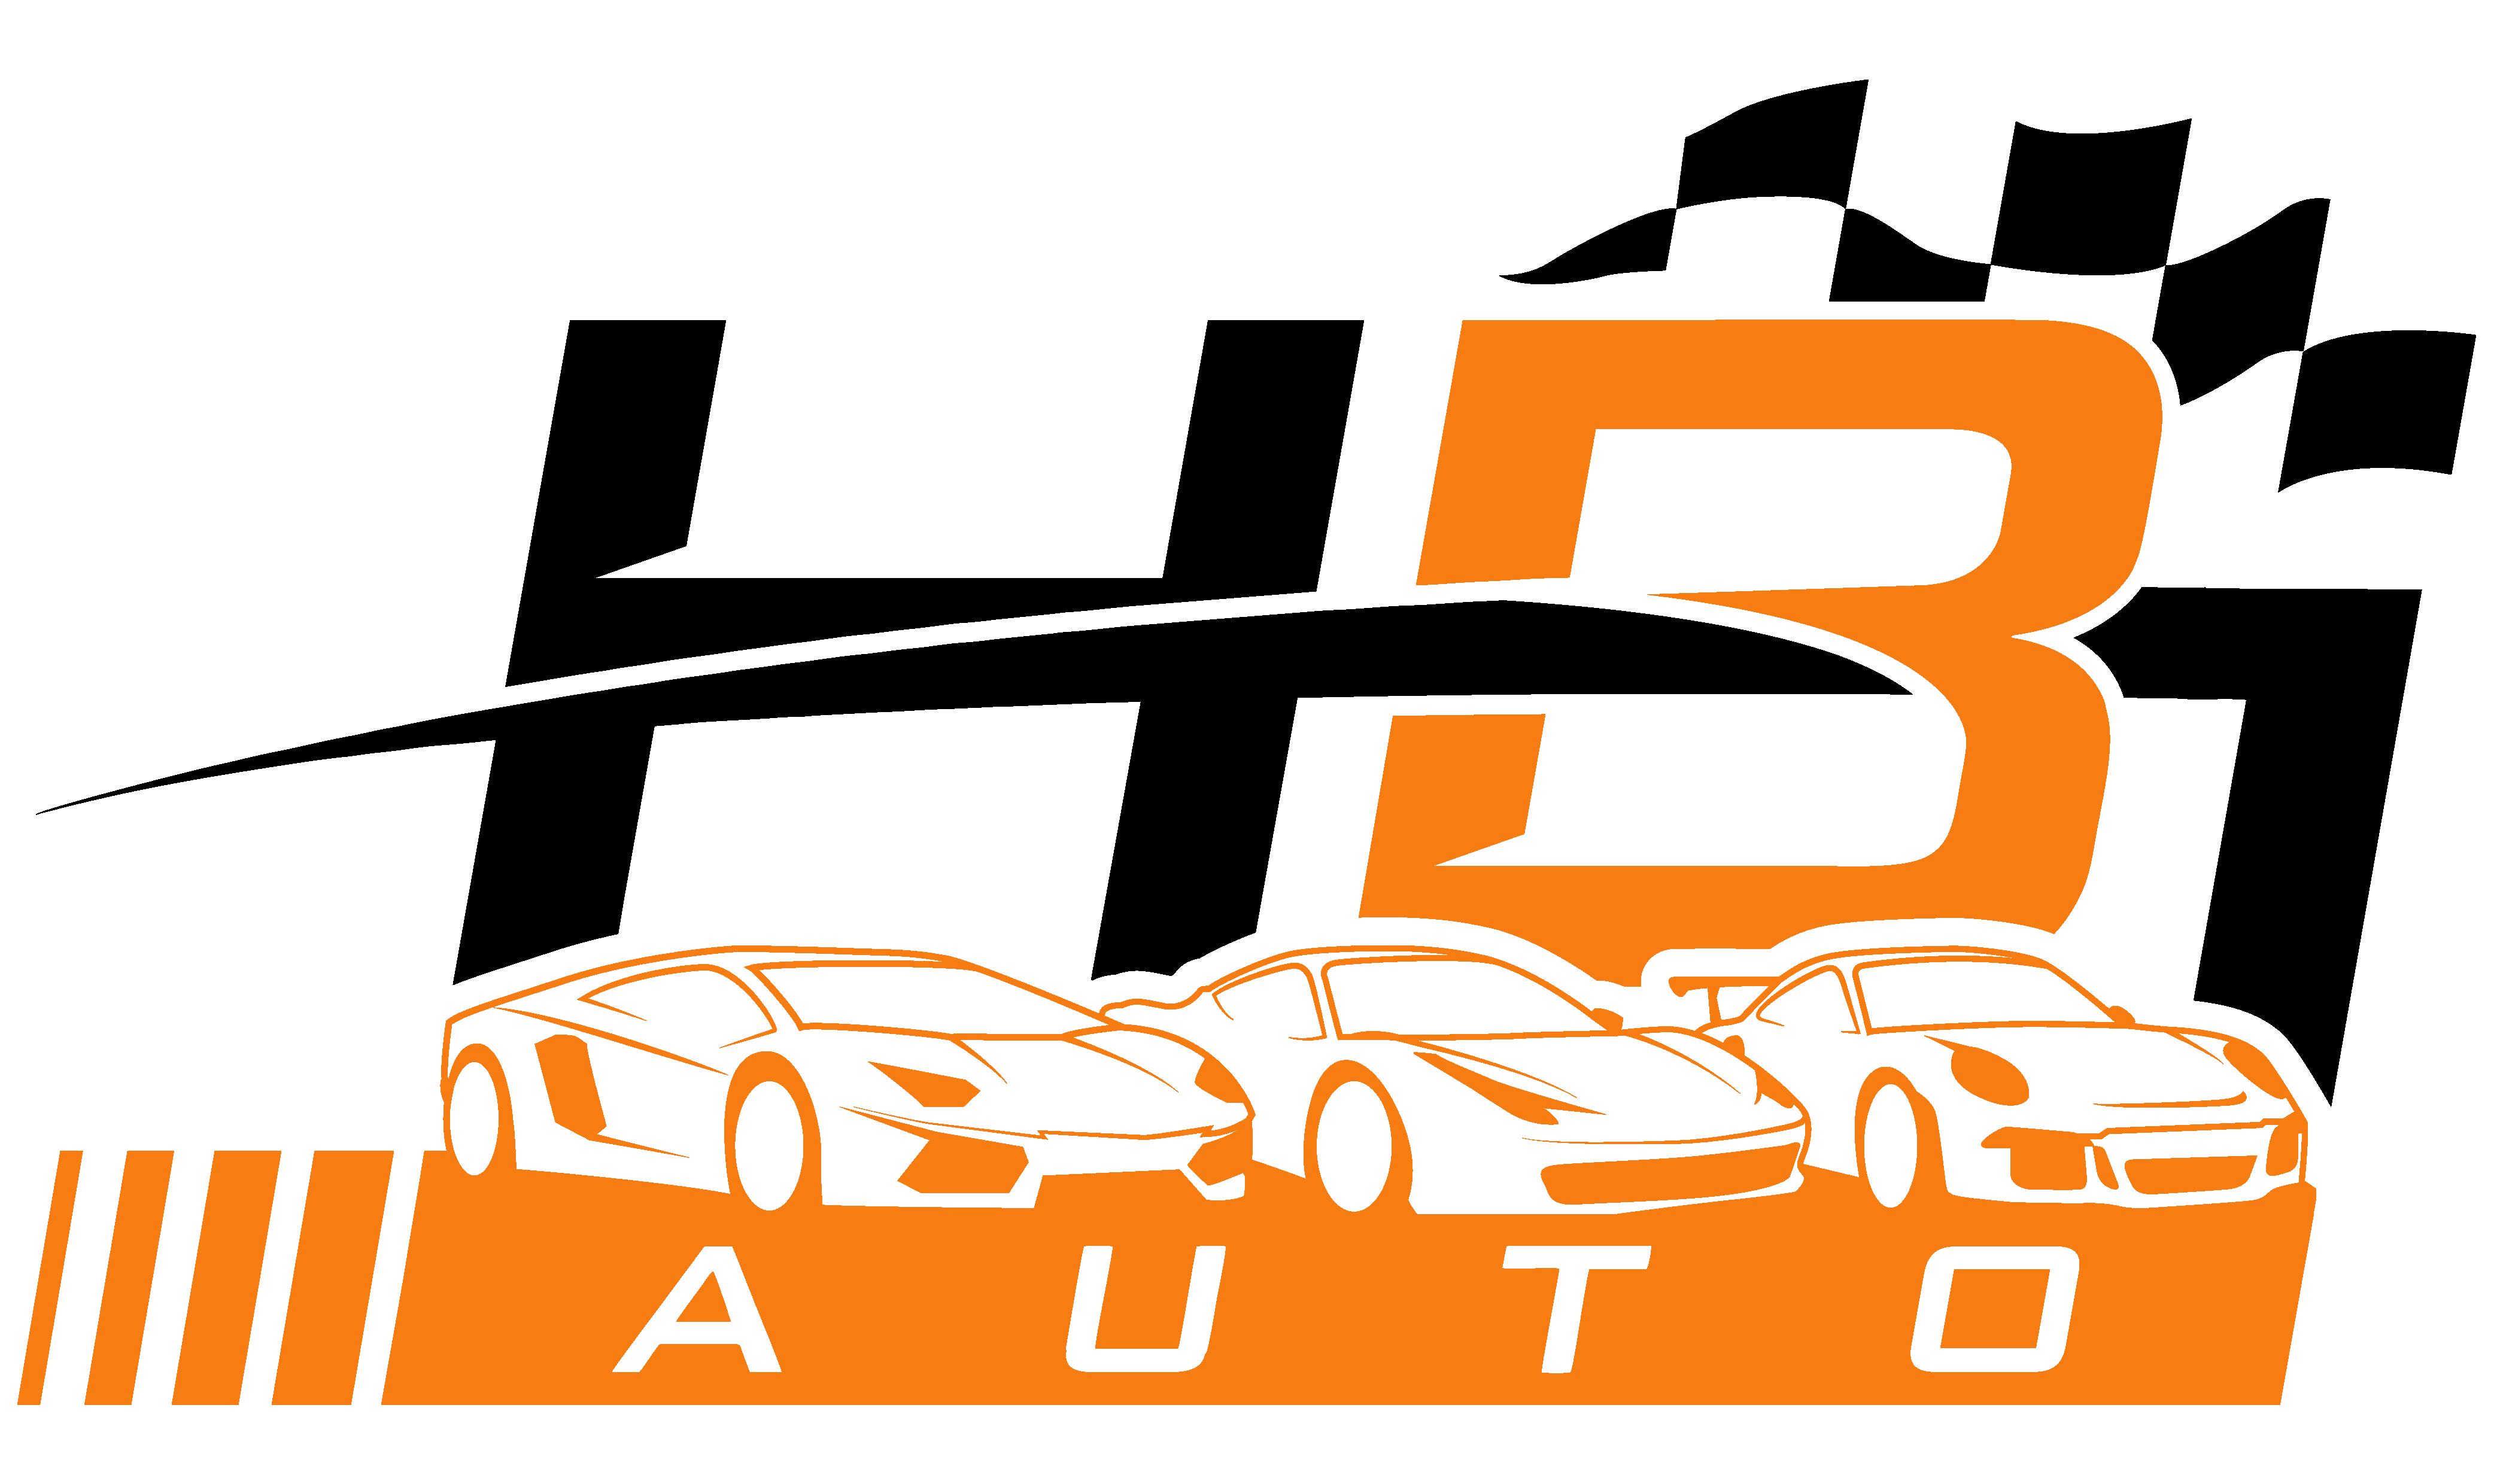 HBi Auto refinement.